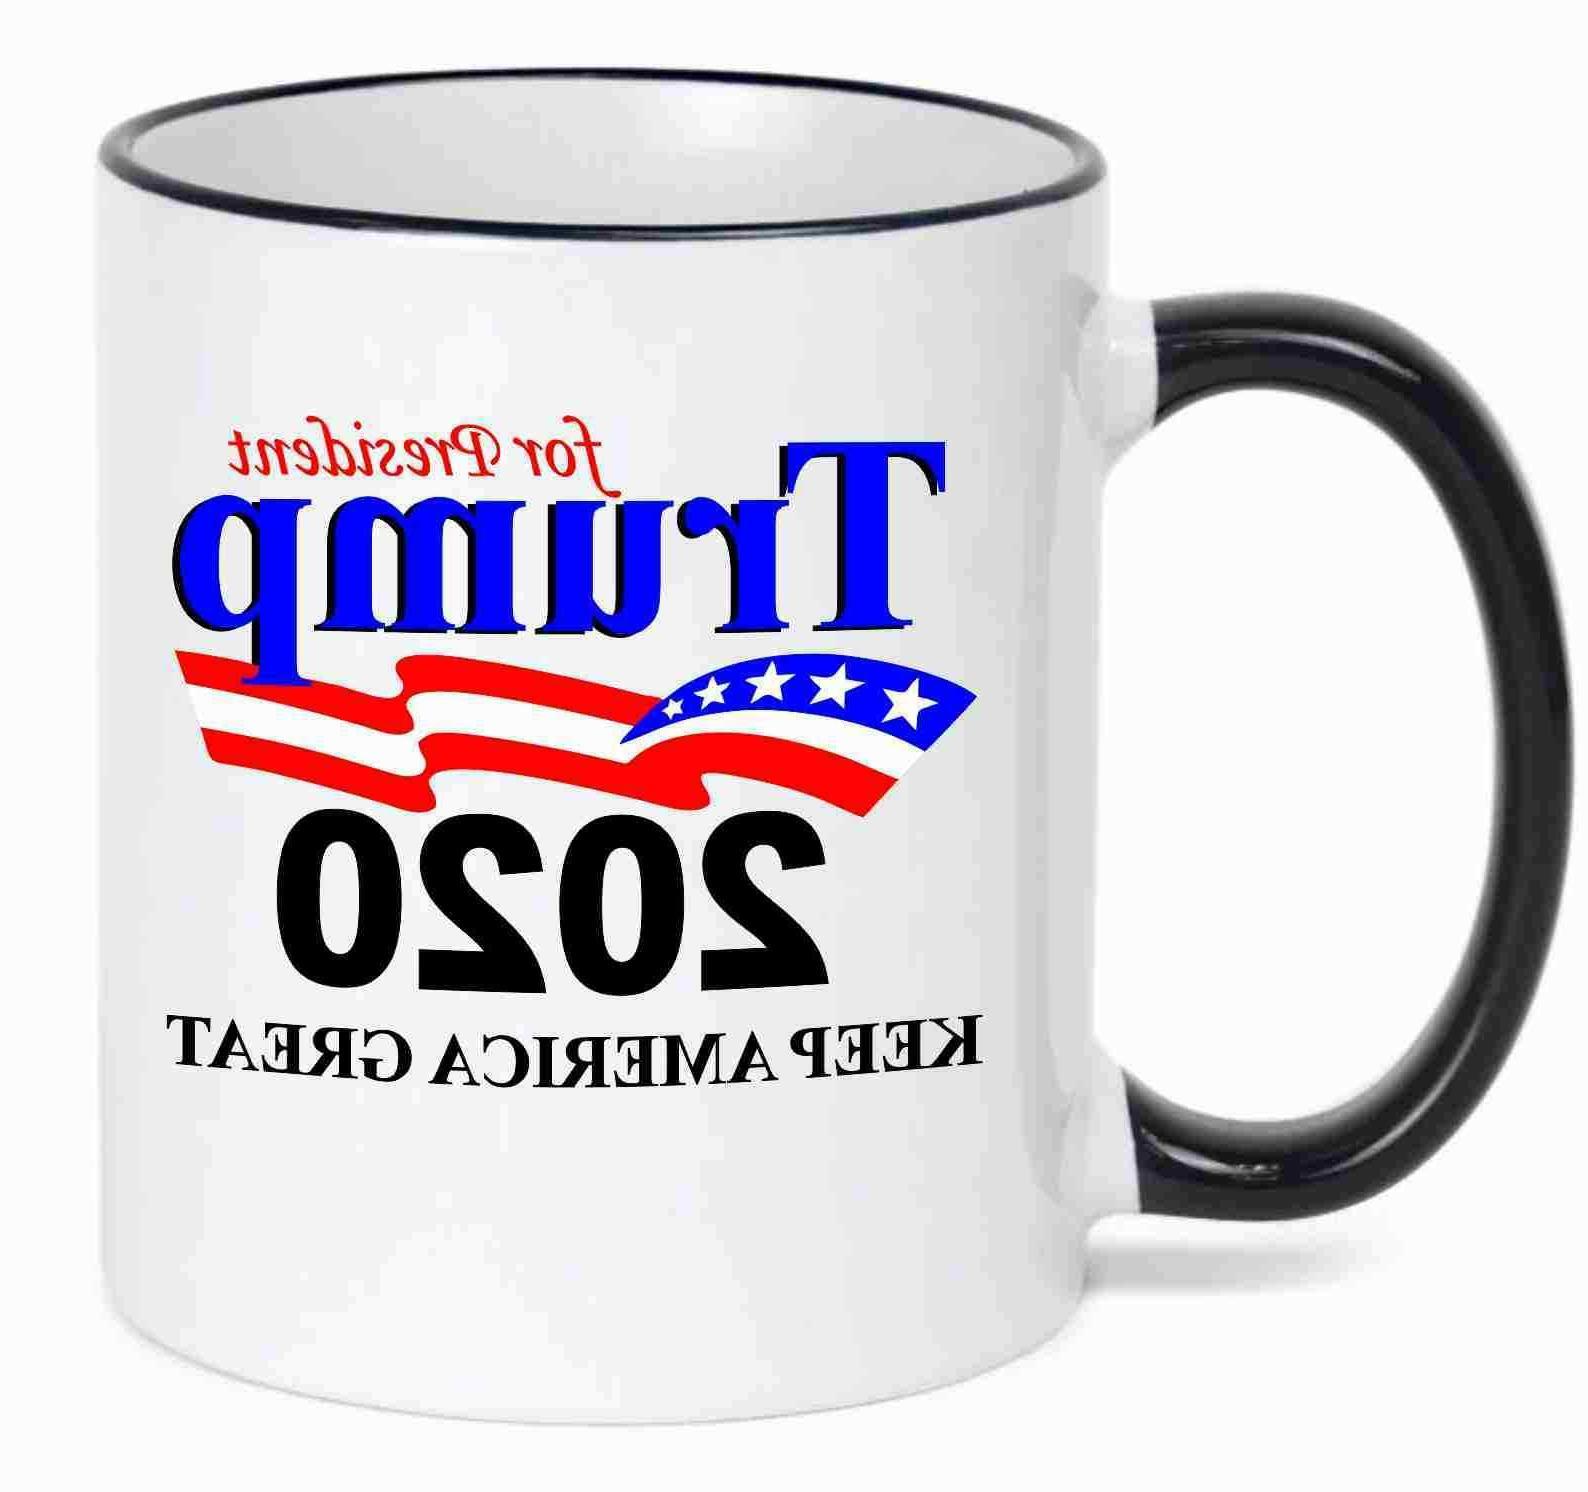 donald trump keep america great 2020 coffee